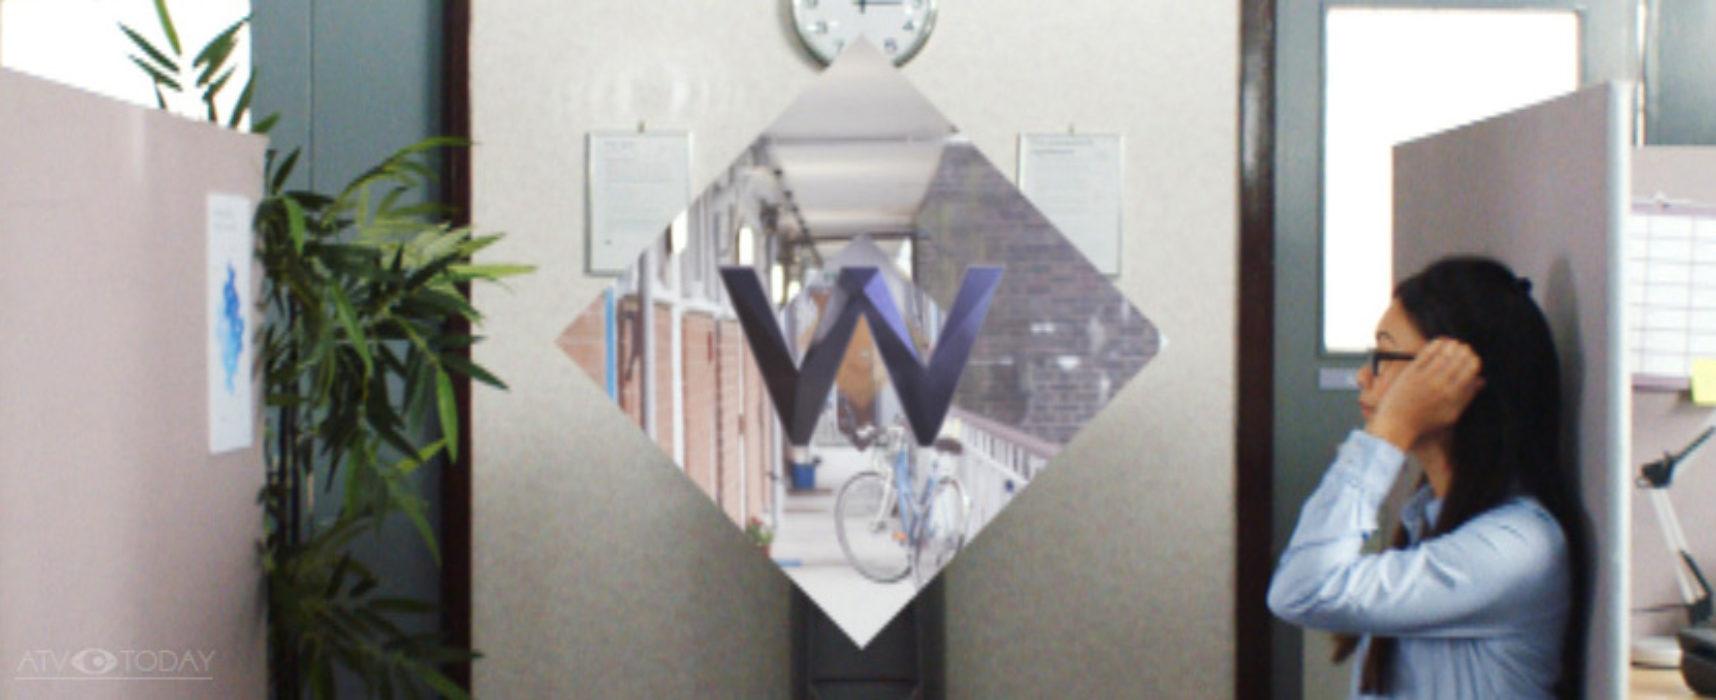 A look at UKTV's W channel branding